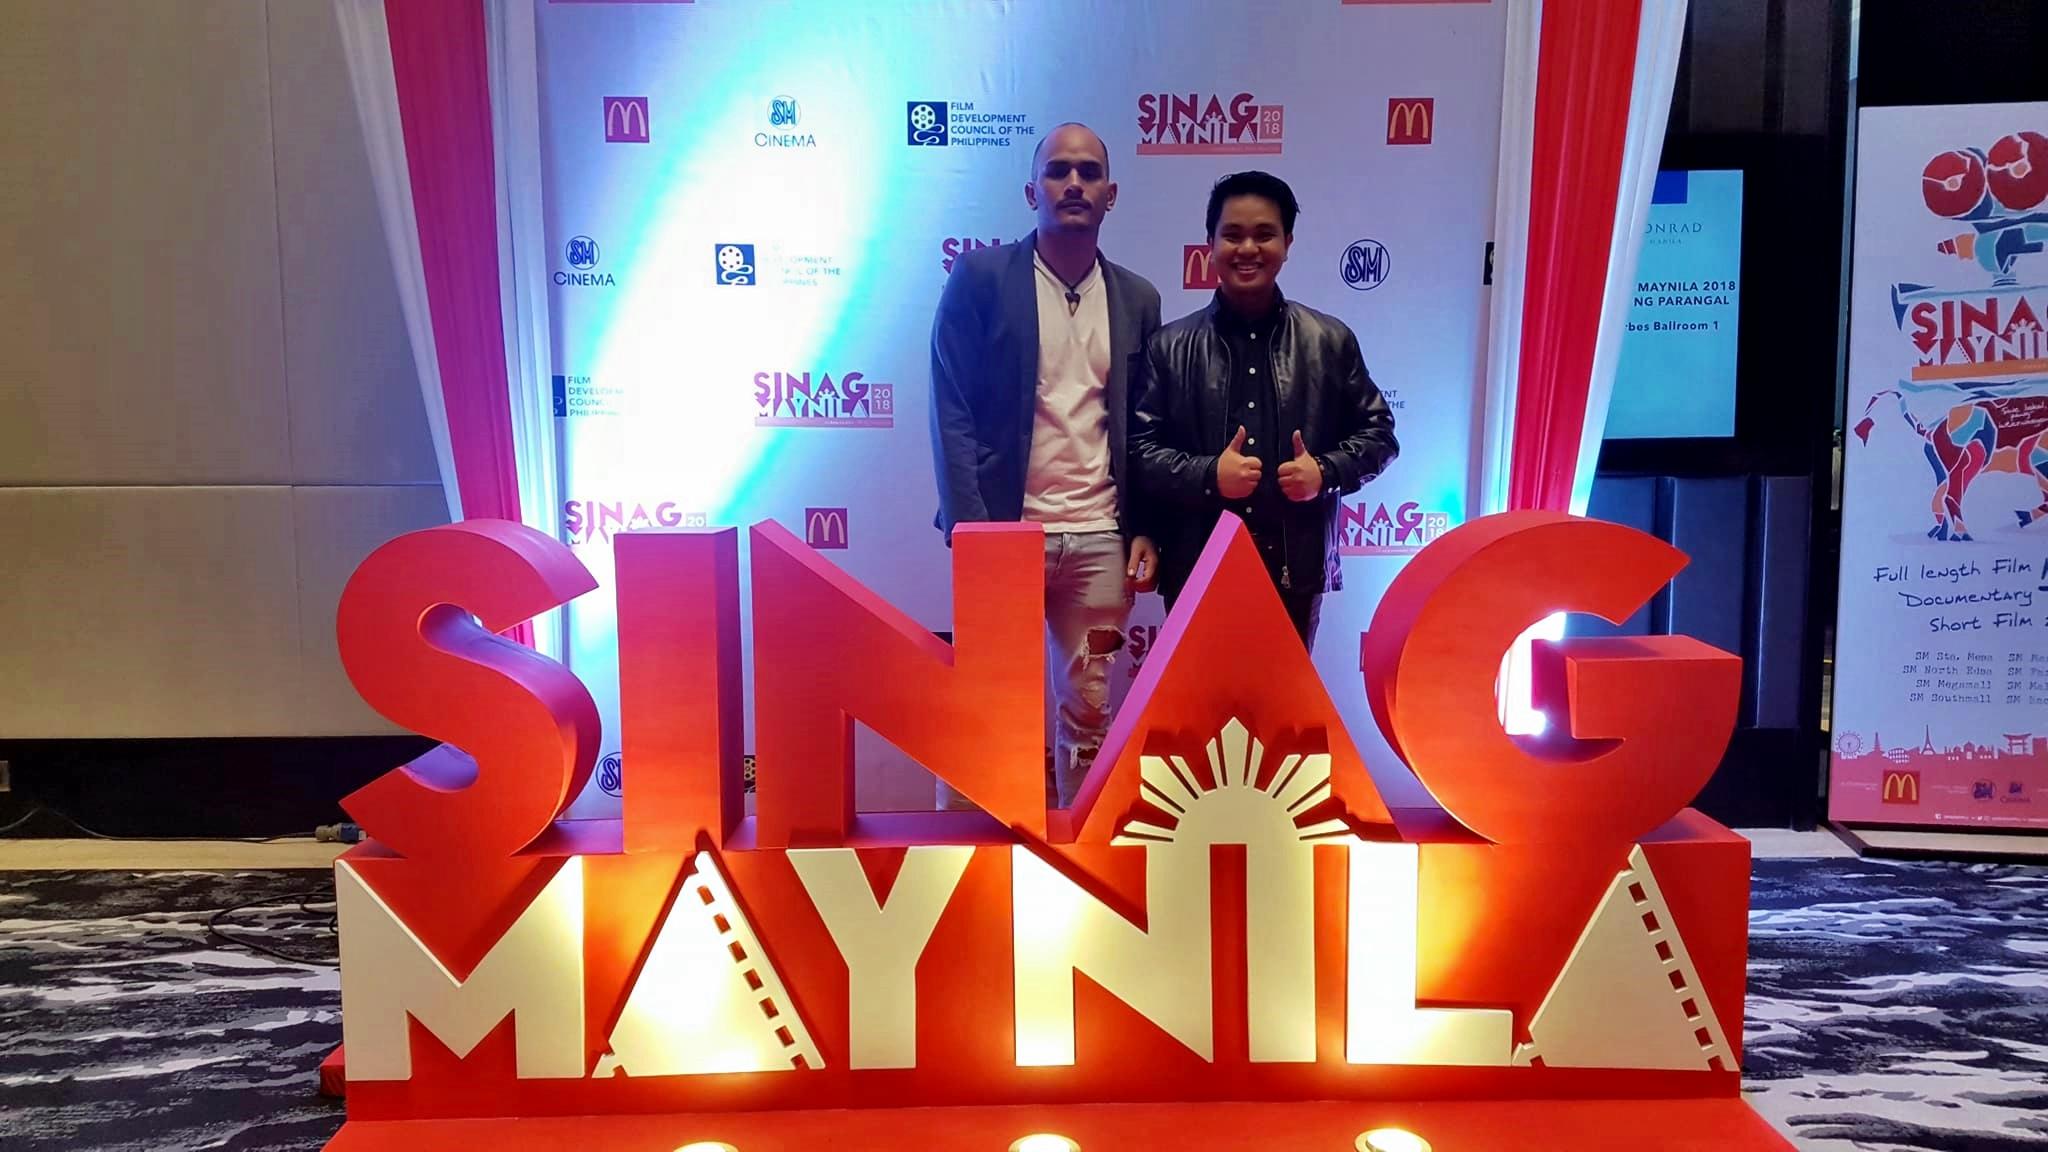 Complete list of 2018 Sinag Maynila Film Festival nominees